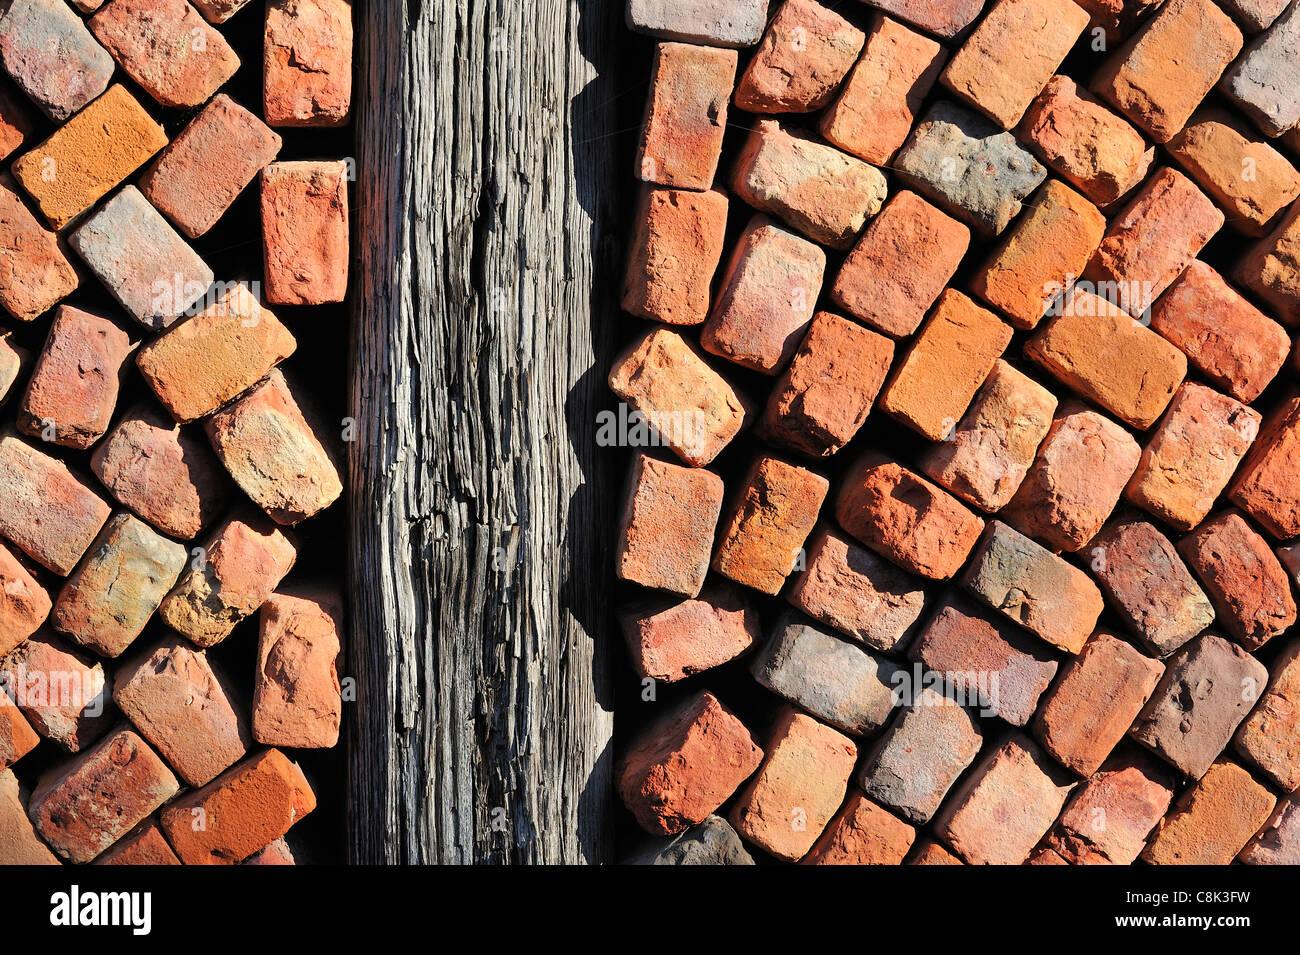 Stacked red bricks as building material at brickworks, Boom, Belgium - Stock Image